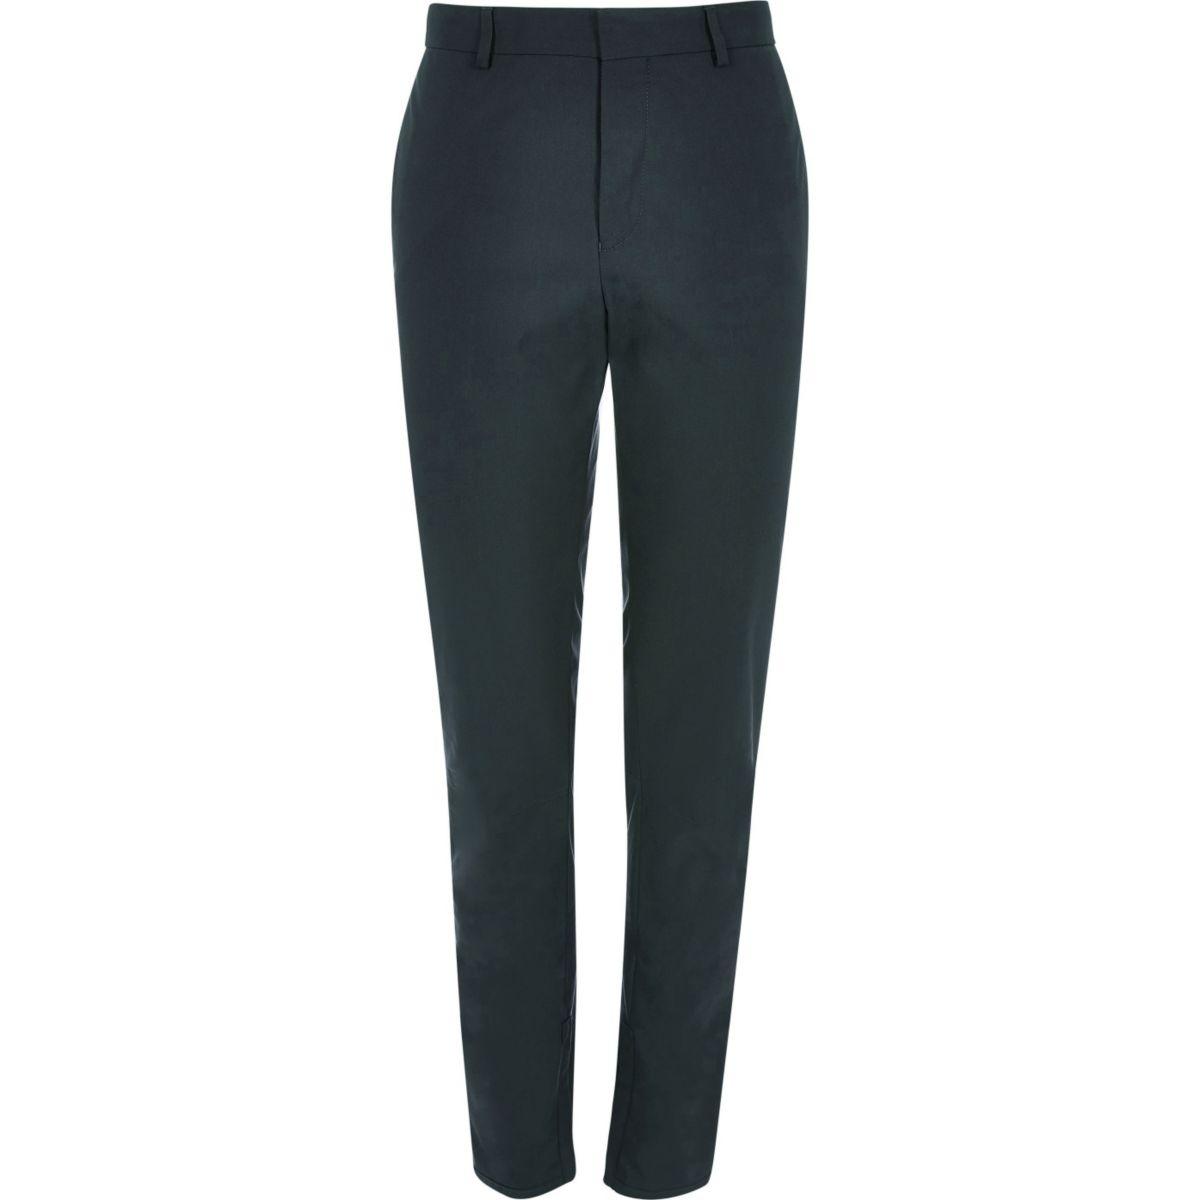 Dark green slim fit tailored pants